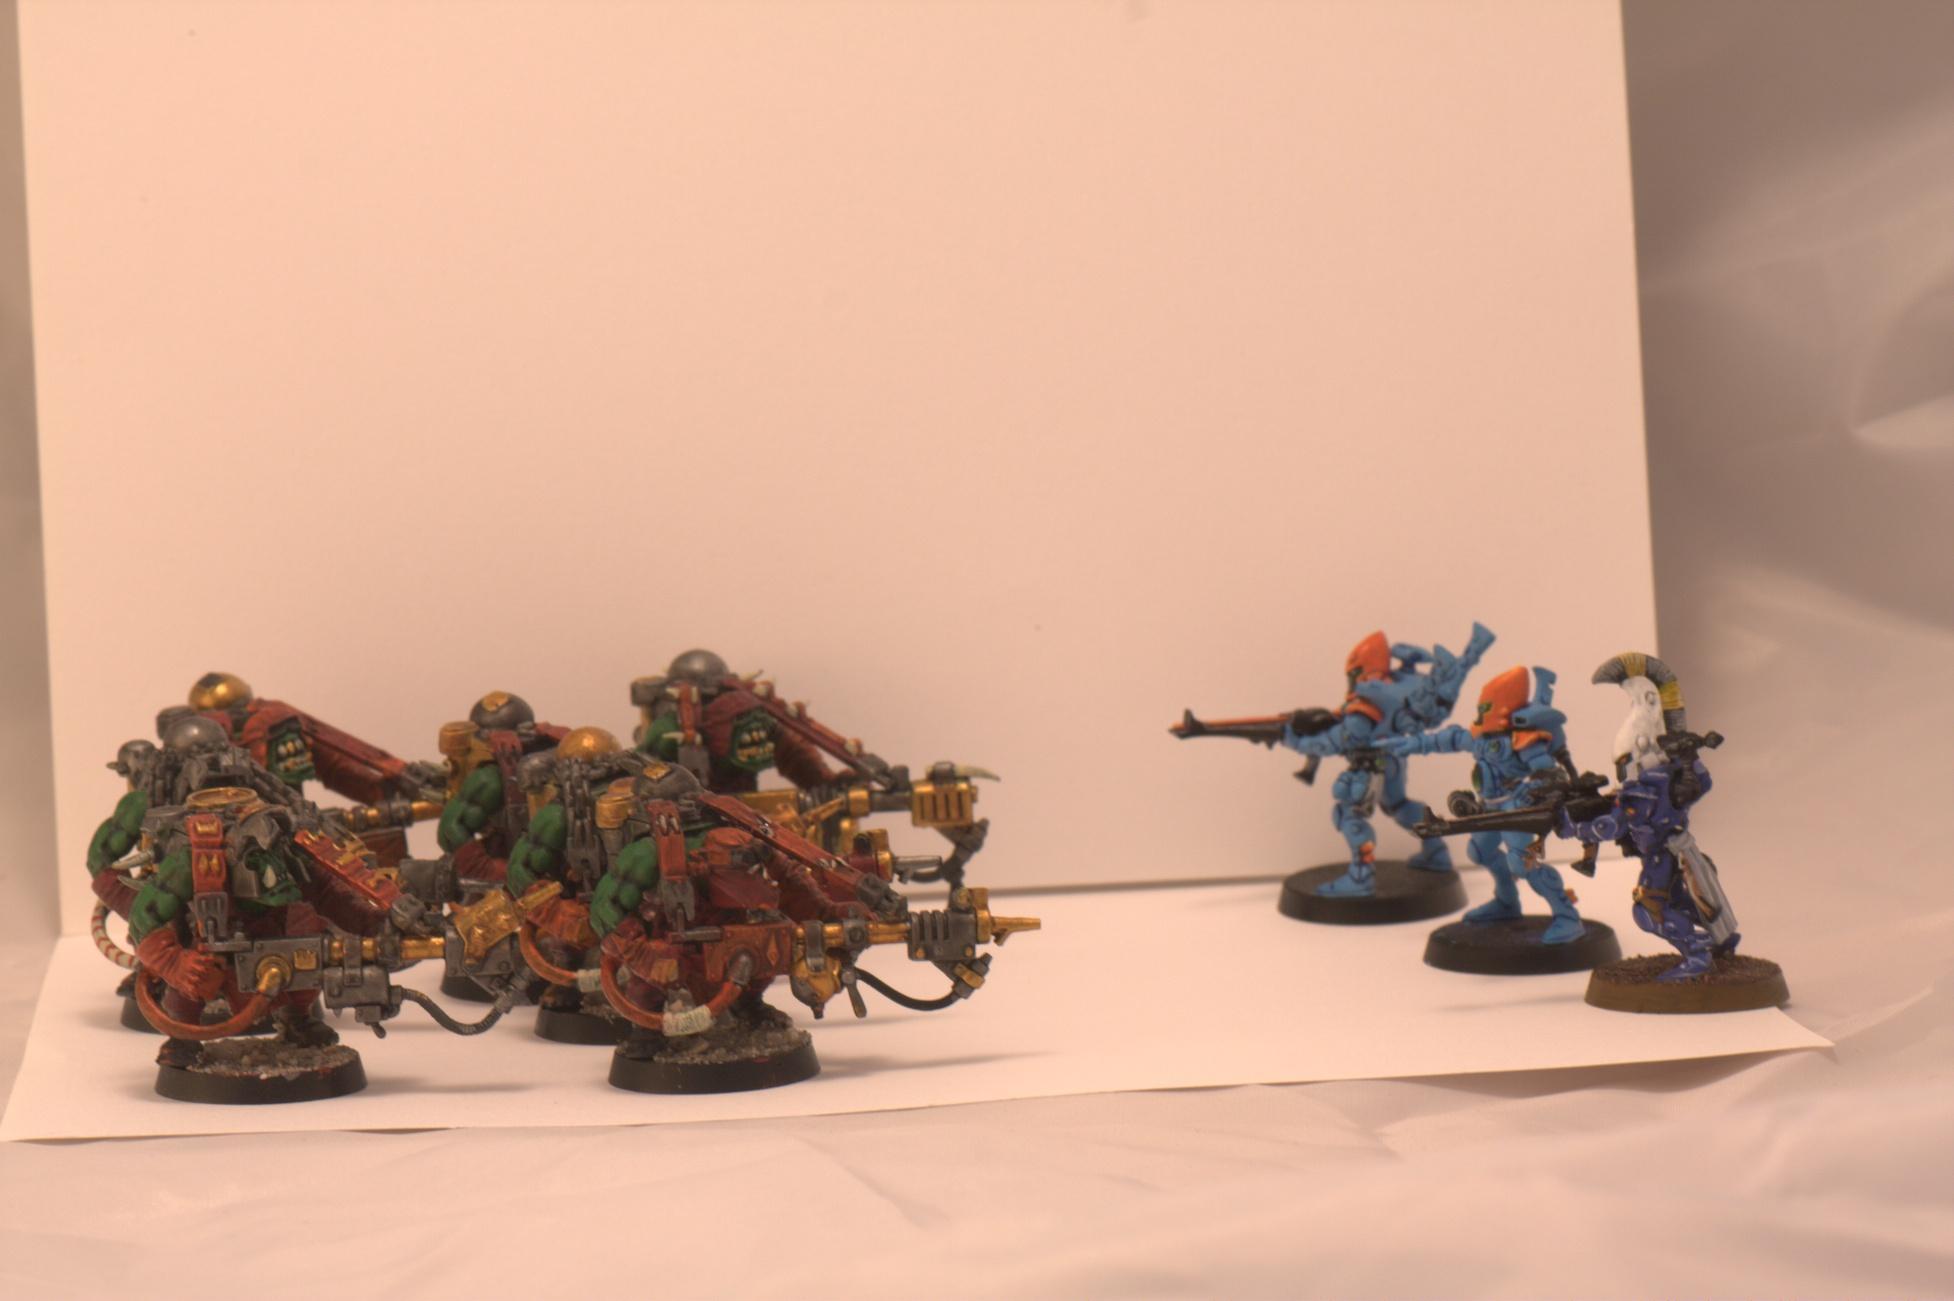 Burna Boyz, Burnas, Dire Avengers, Eldar, Guardians, Orks